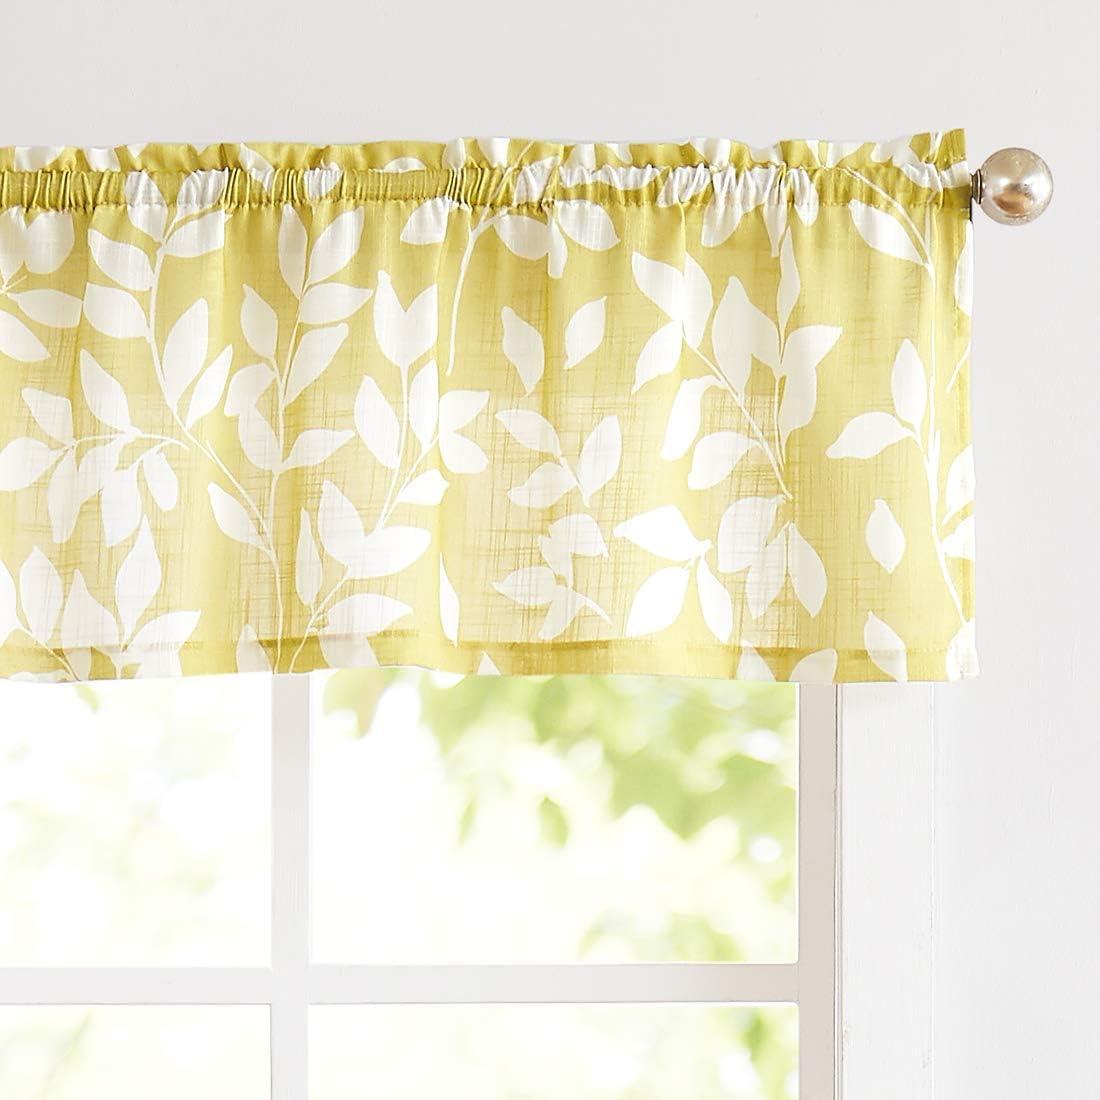 Amazon Com Treatmentex Valance Curtain For Window 15 Leaf Print Kitchen Valances Mustard Yellow And White 52 W 1 Panel Home Kitchen